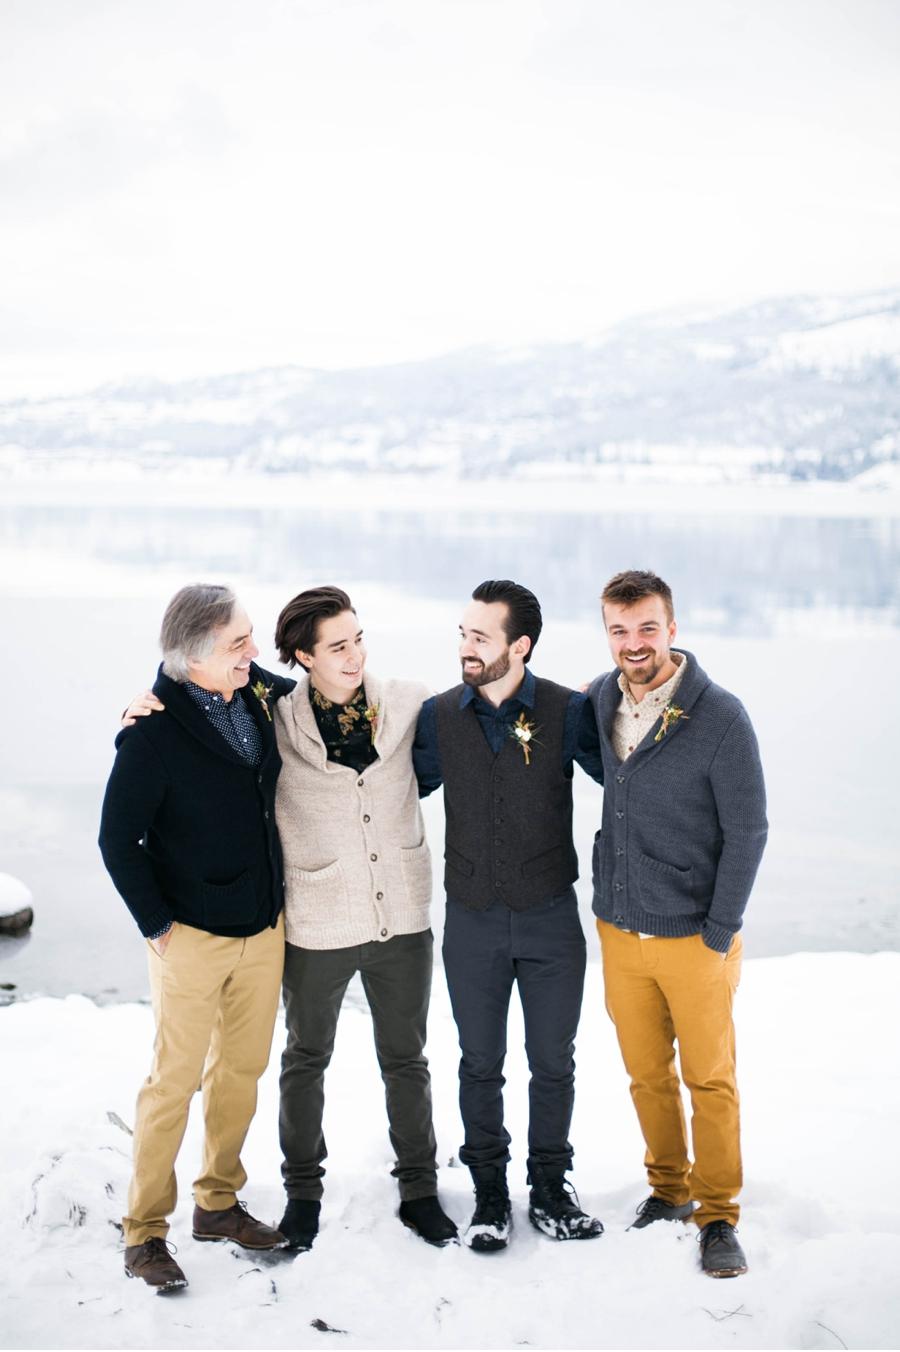 Casual-Winter-Wedding-Attire-for-Groomsmen